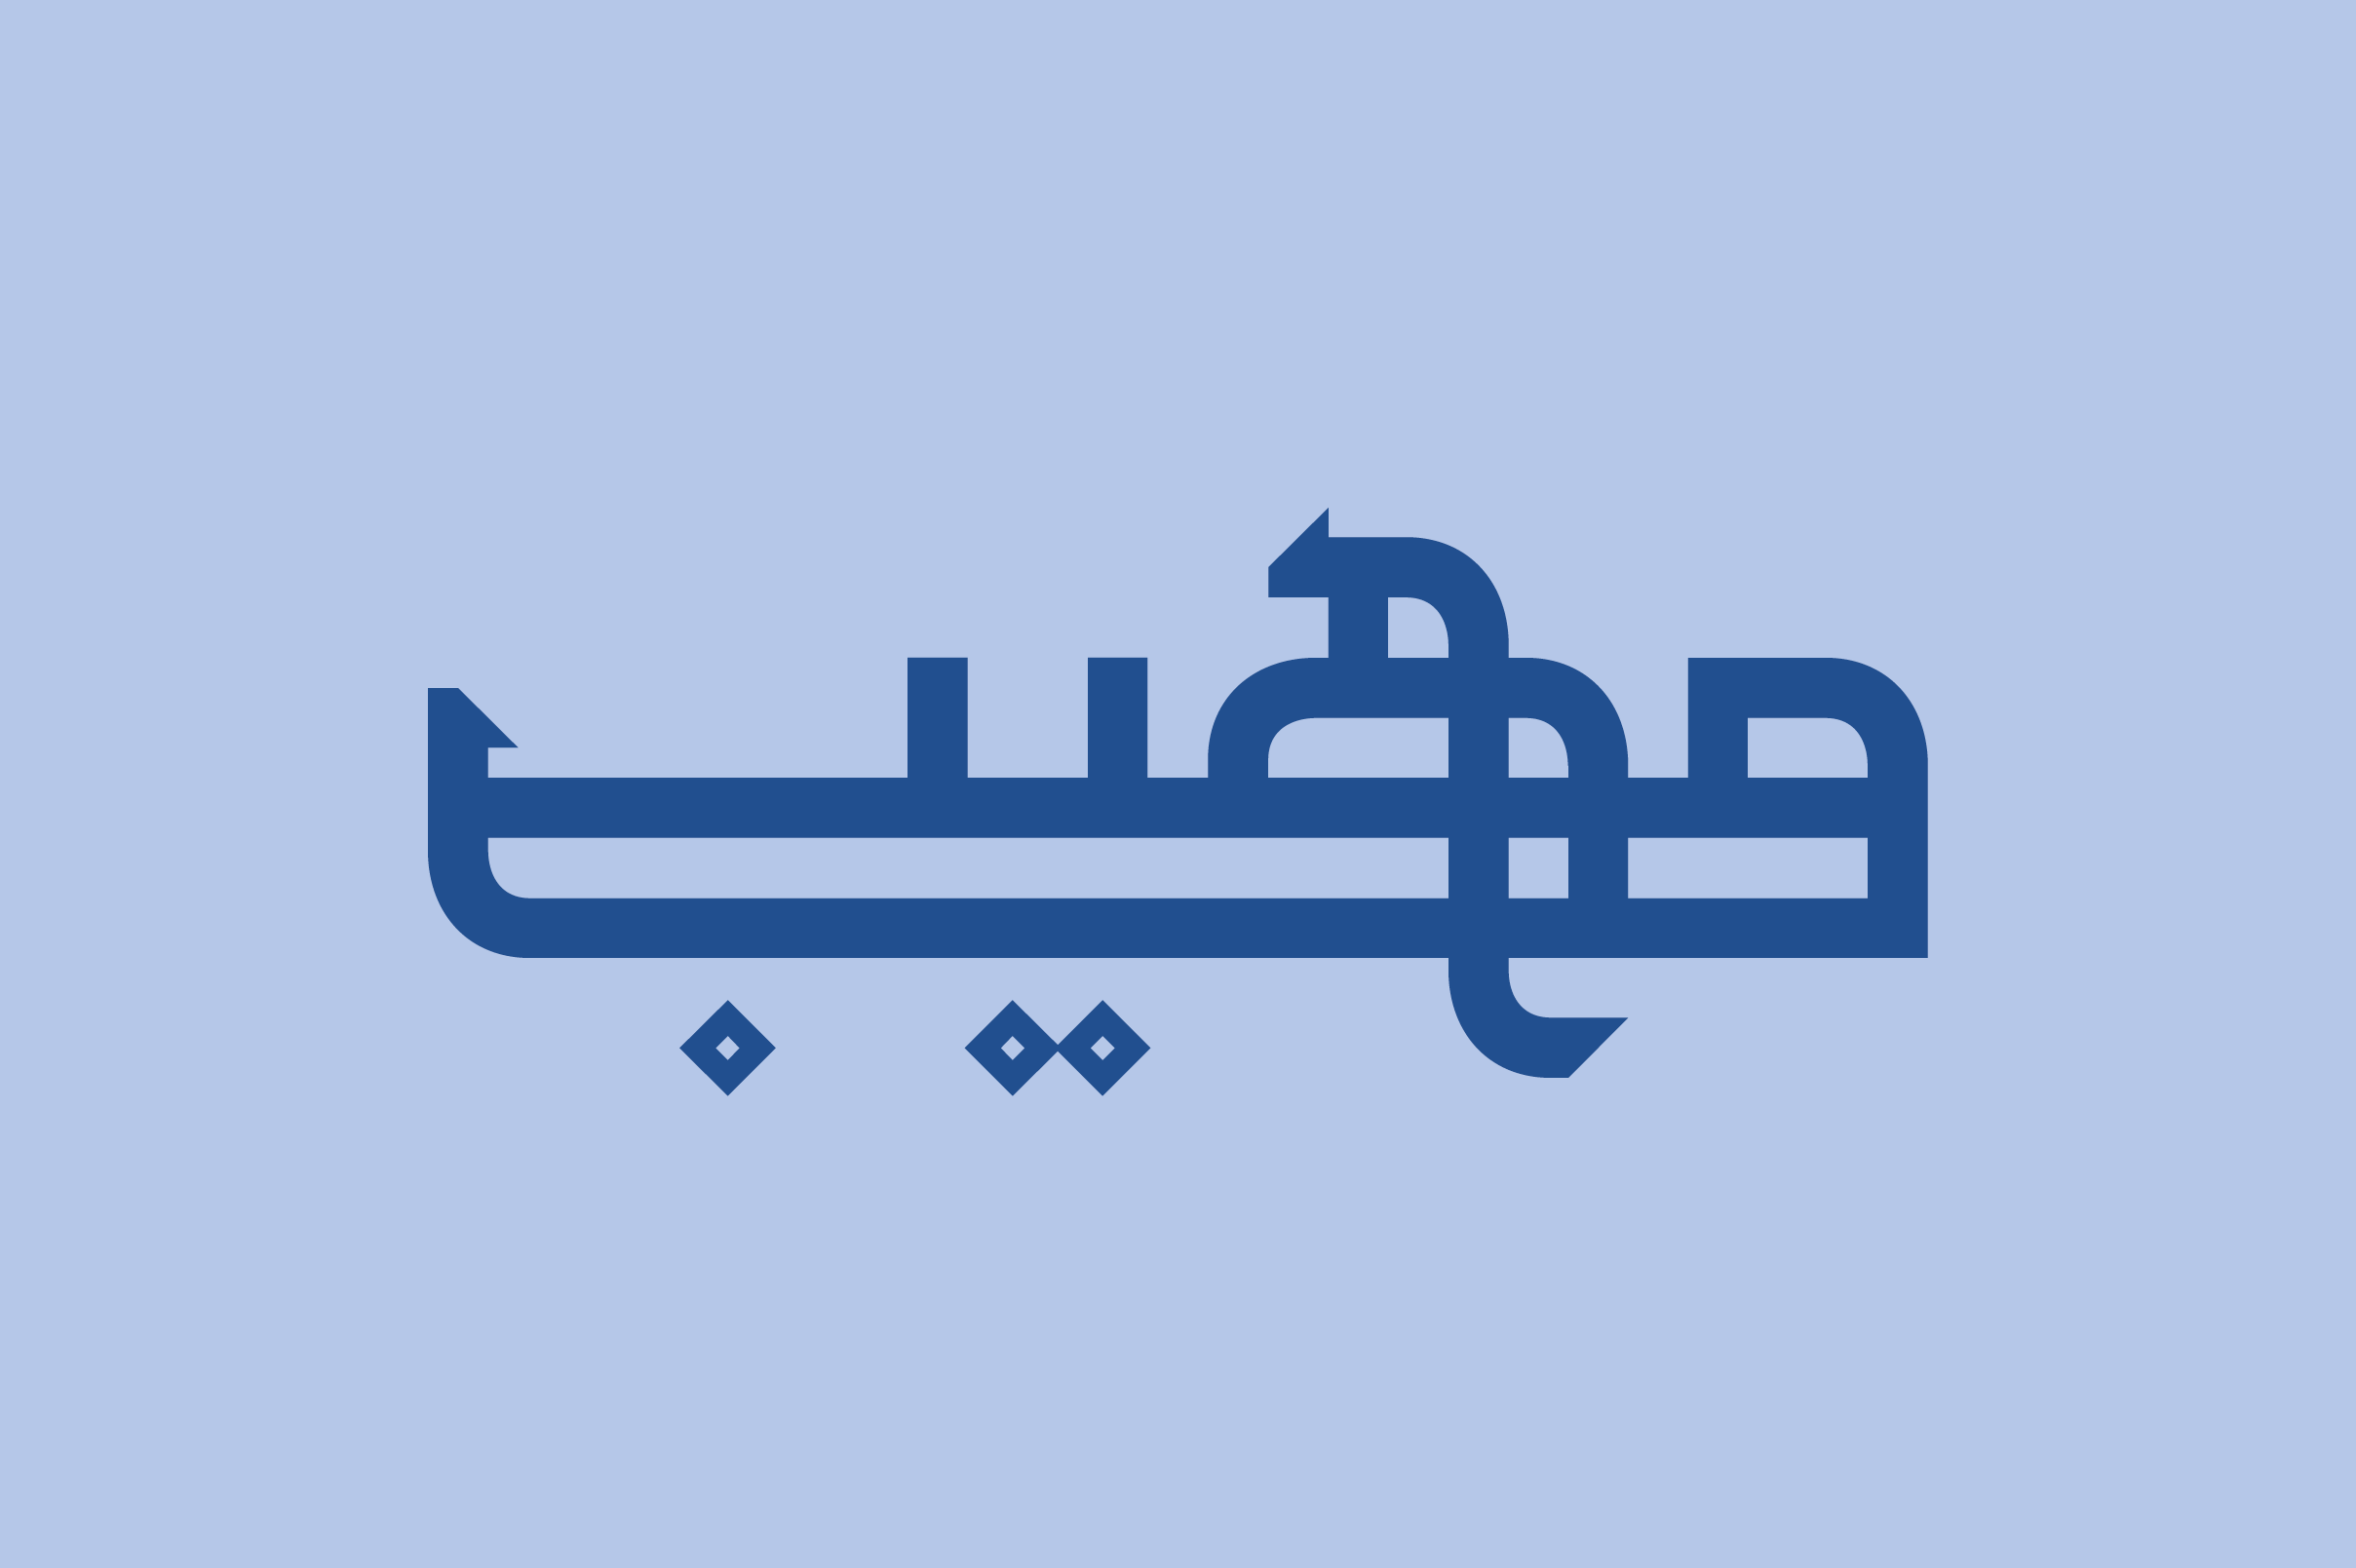 Maheeb - Arabic Font example image 1